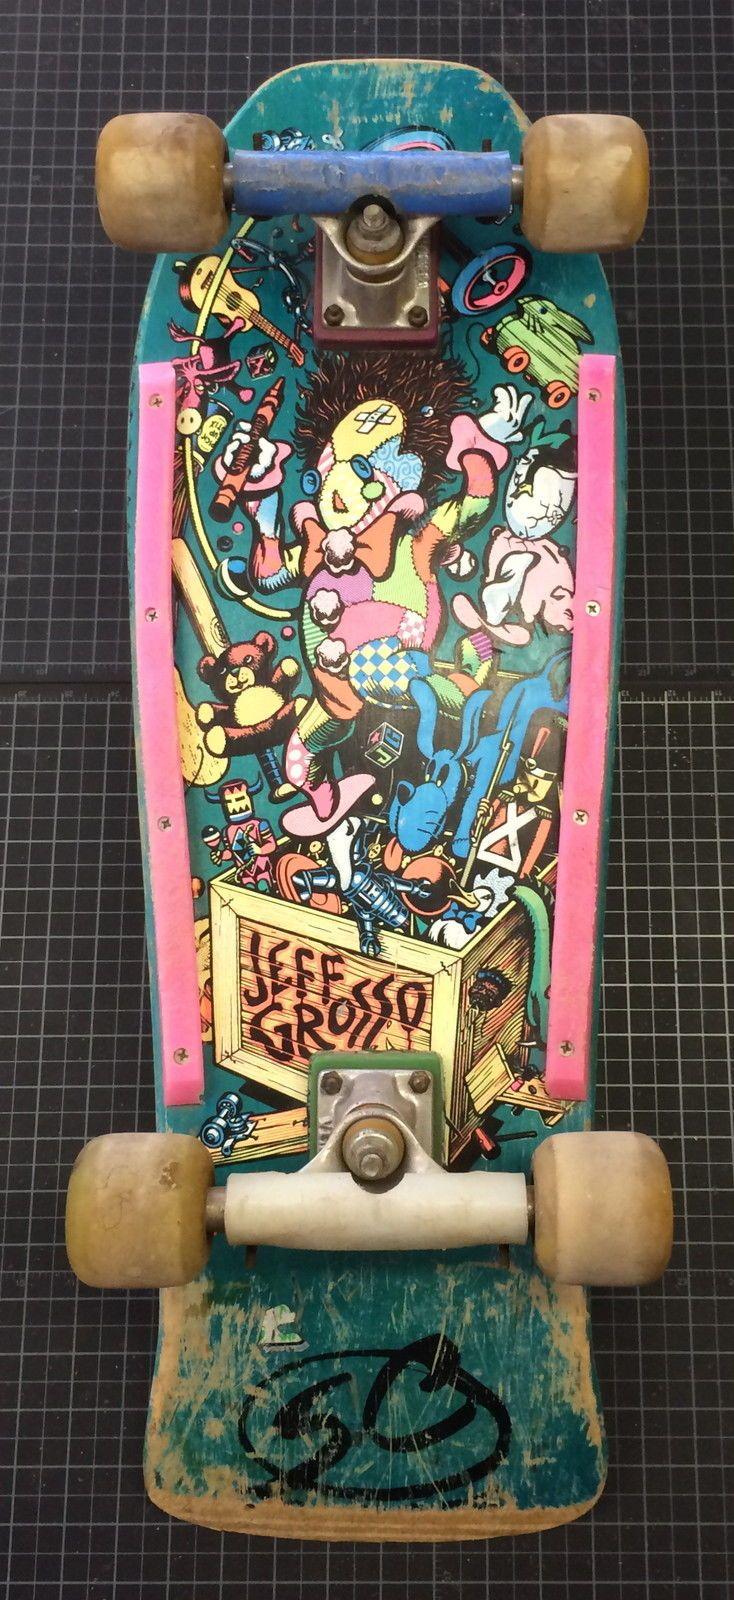 4c37b17f27 RARE Vintage 1987 Santa Cruz Jeff Grosso Toy Box skateboard - not a ...